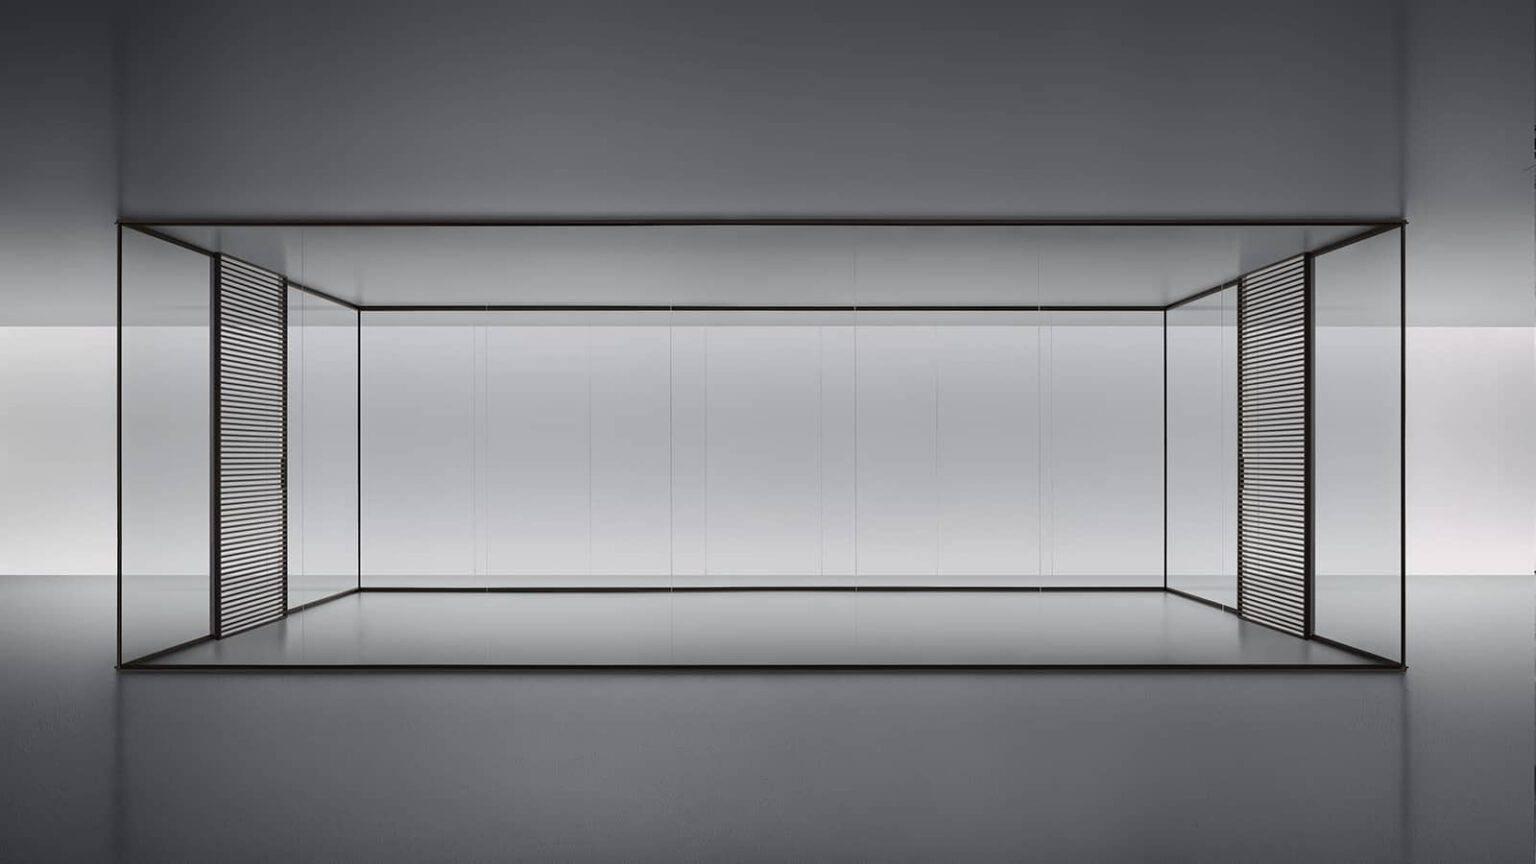 design-stripe-schuifdeur-rimadesio-met-akoestische-glazen-wanden-spazio